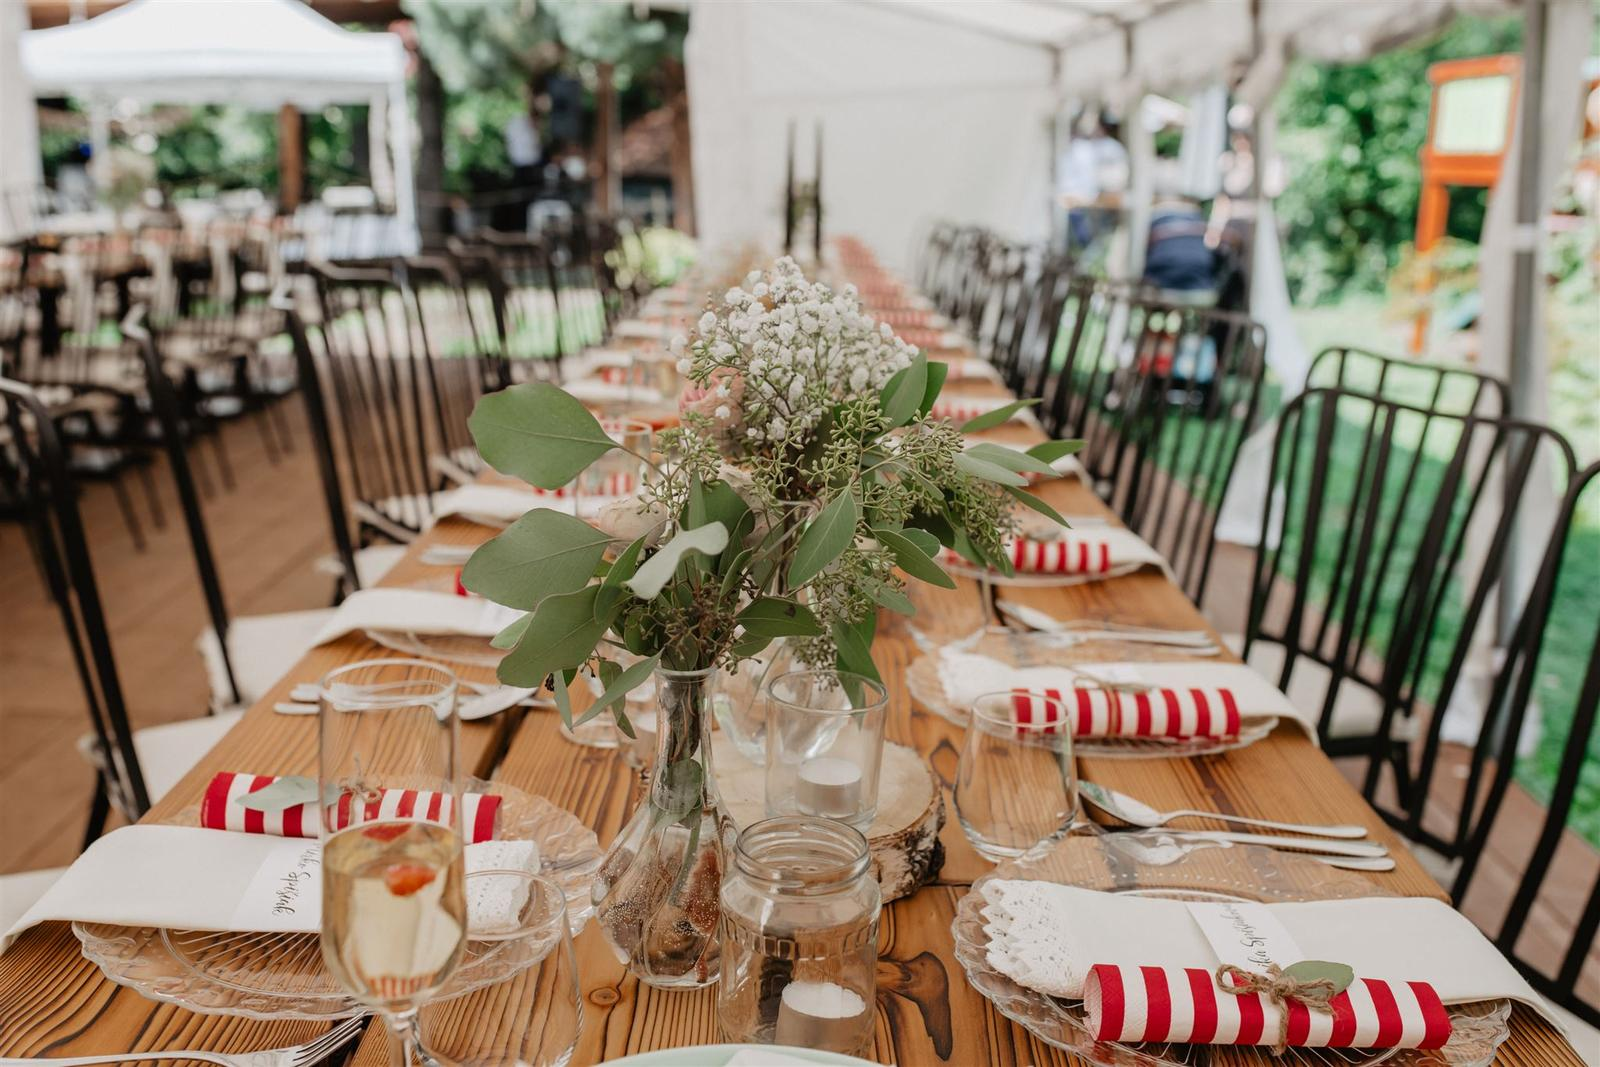 Krásna a romantická svadobná party v záhrade reštaurácie Bistra Dukát - Le Gout v srdci B. Bystrice. - Obrázok č. 11